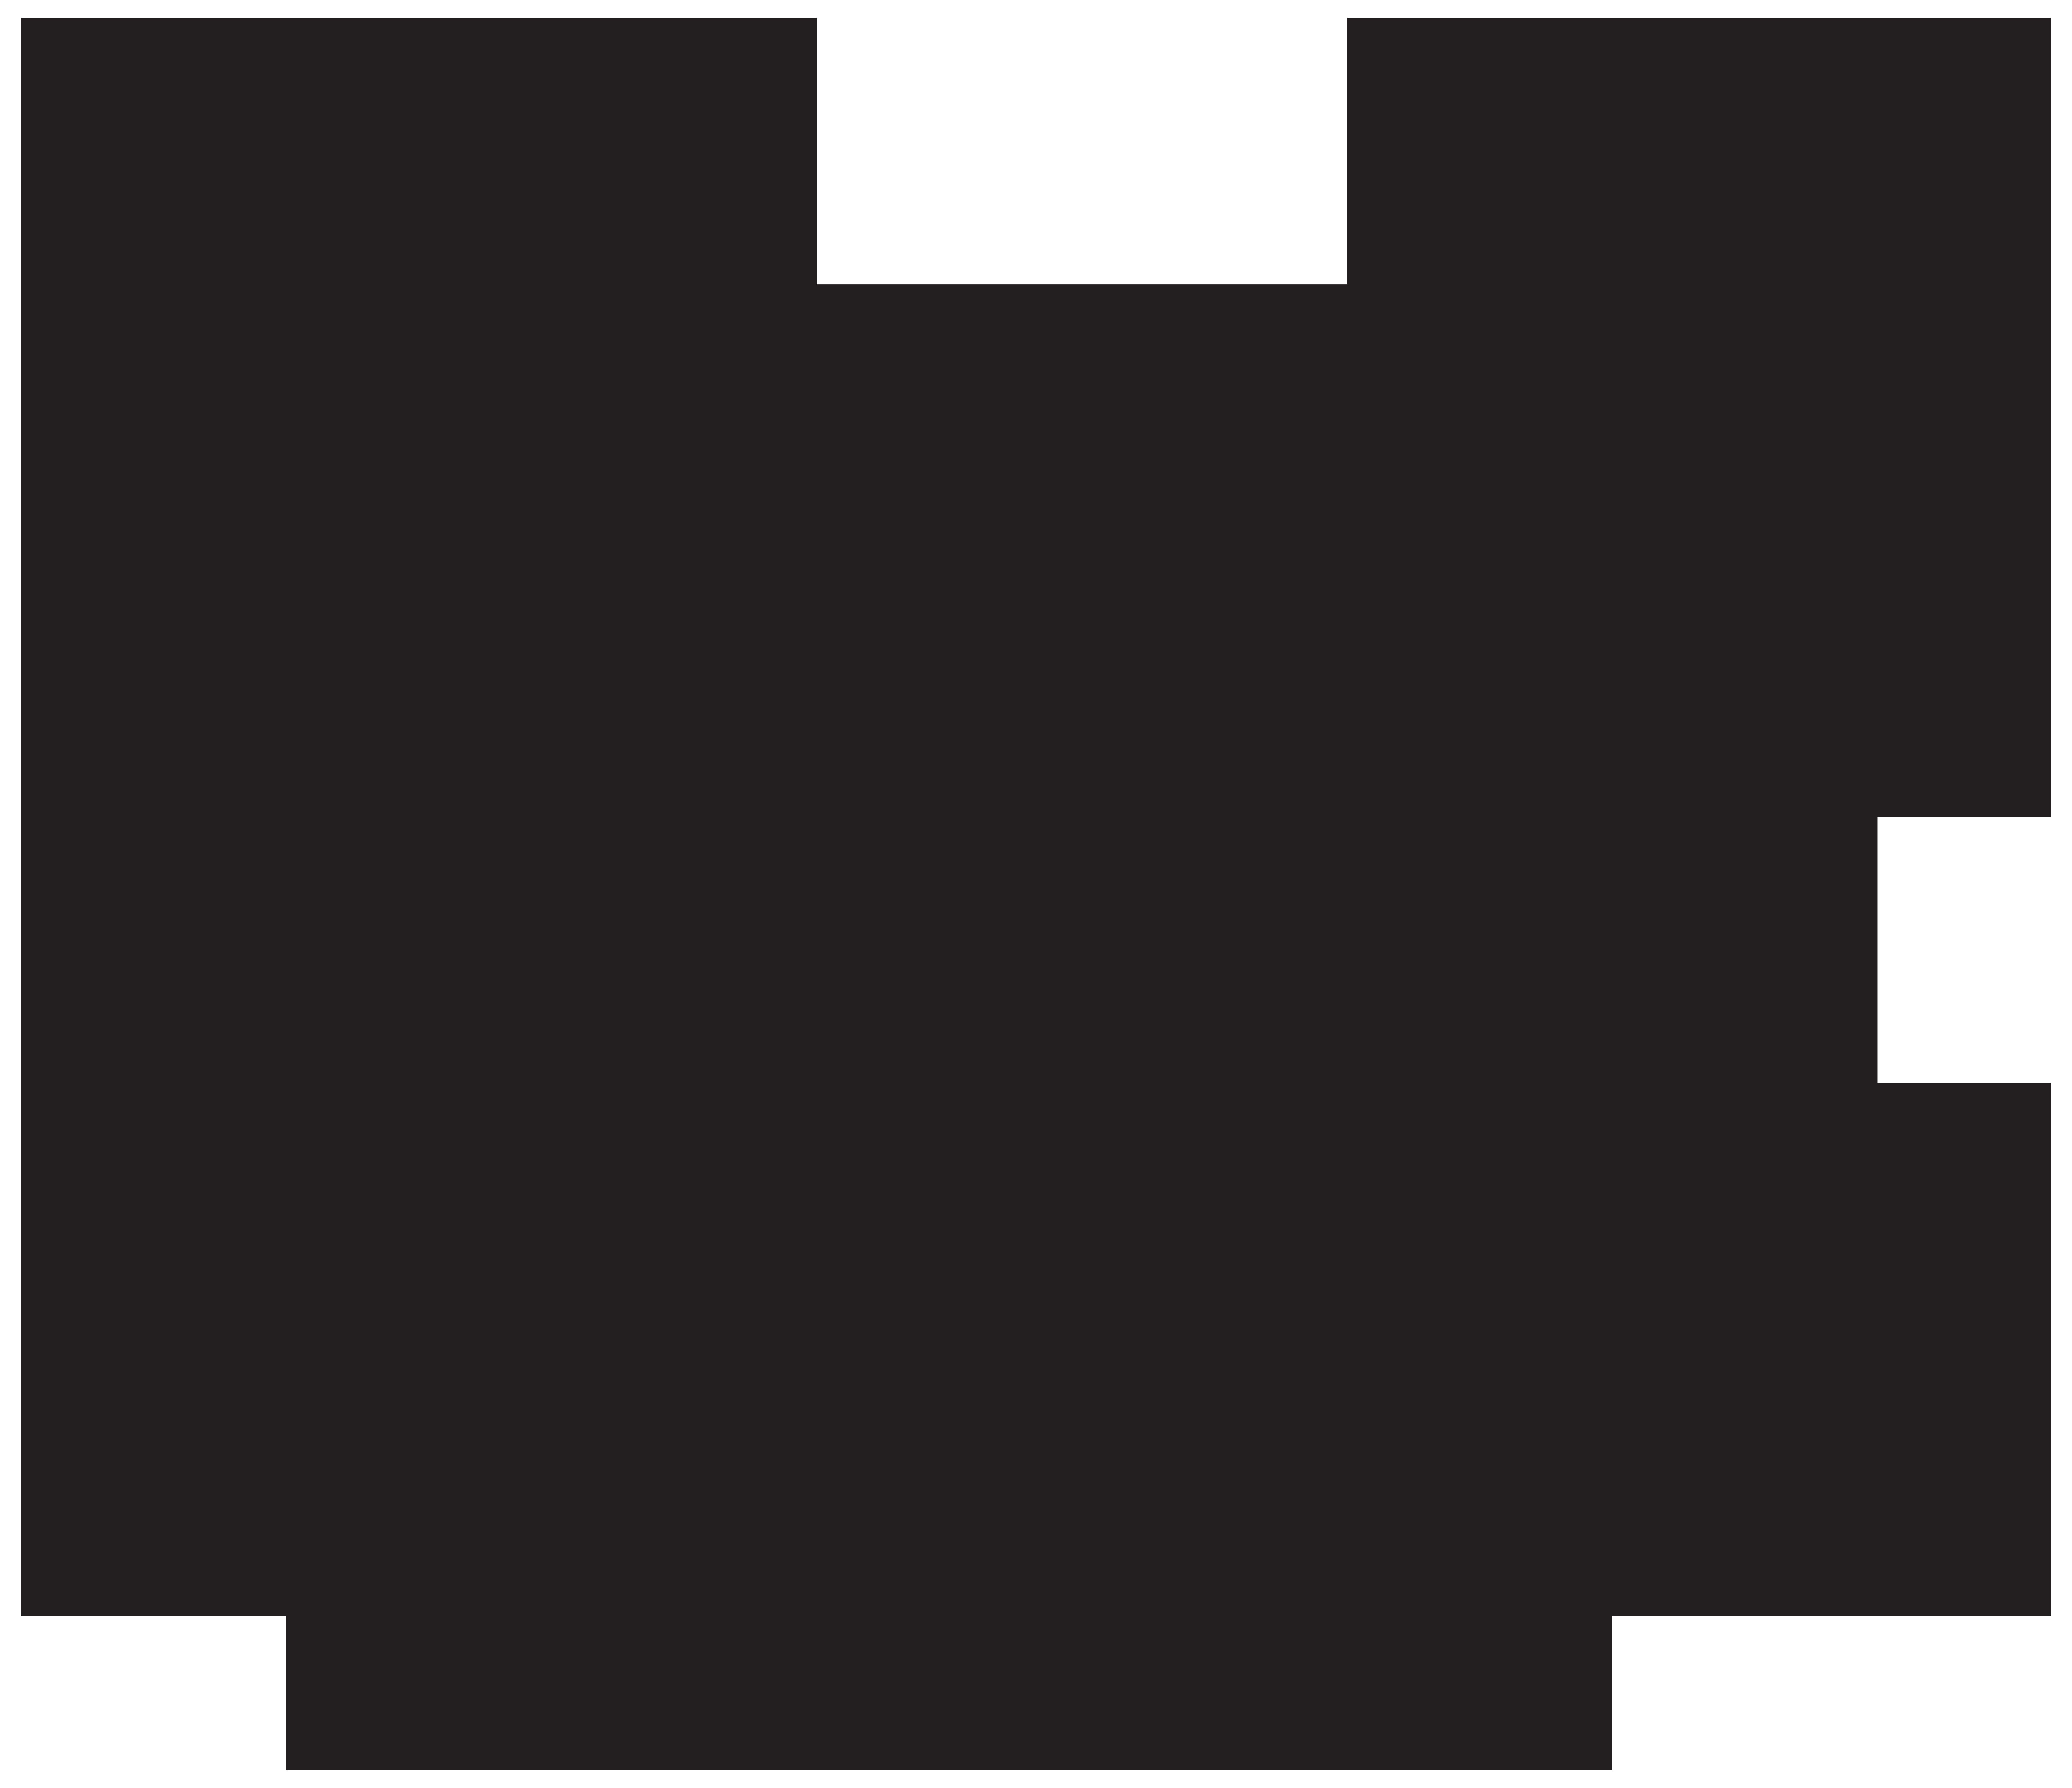 Eyebrow clipart long eyelash. Strips png transparent clip